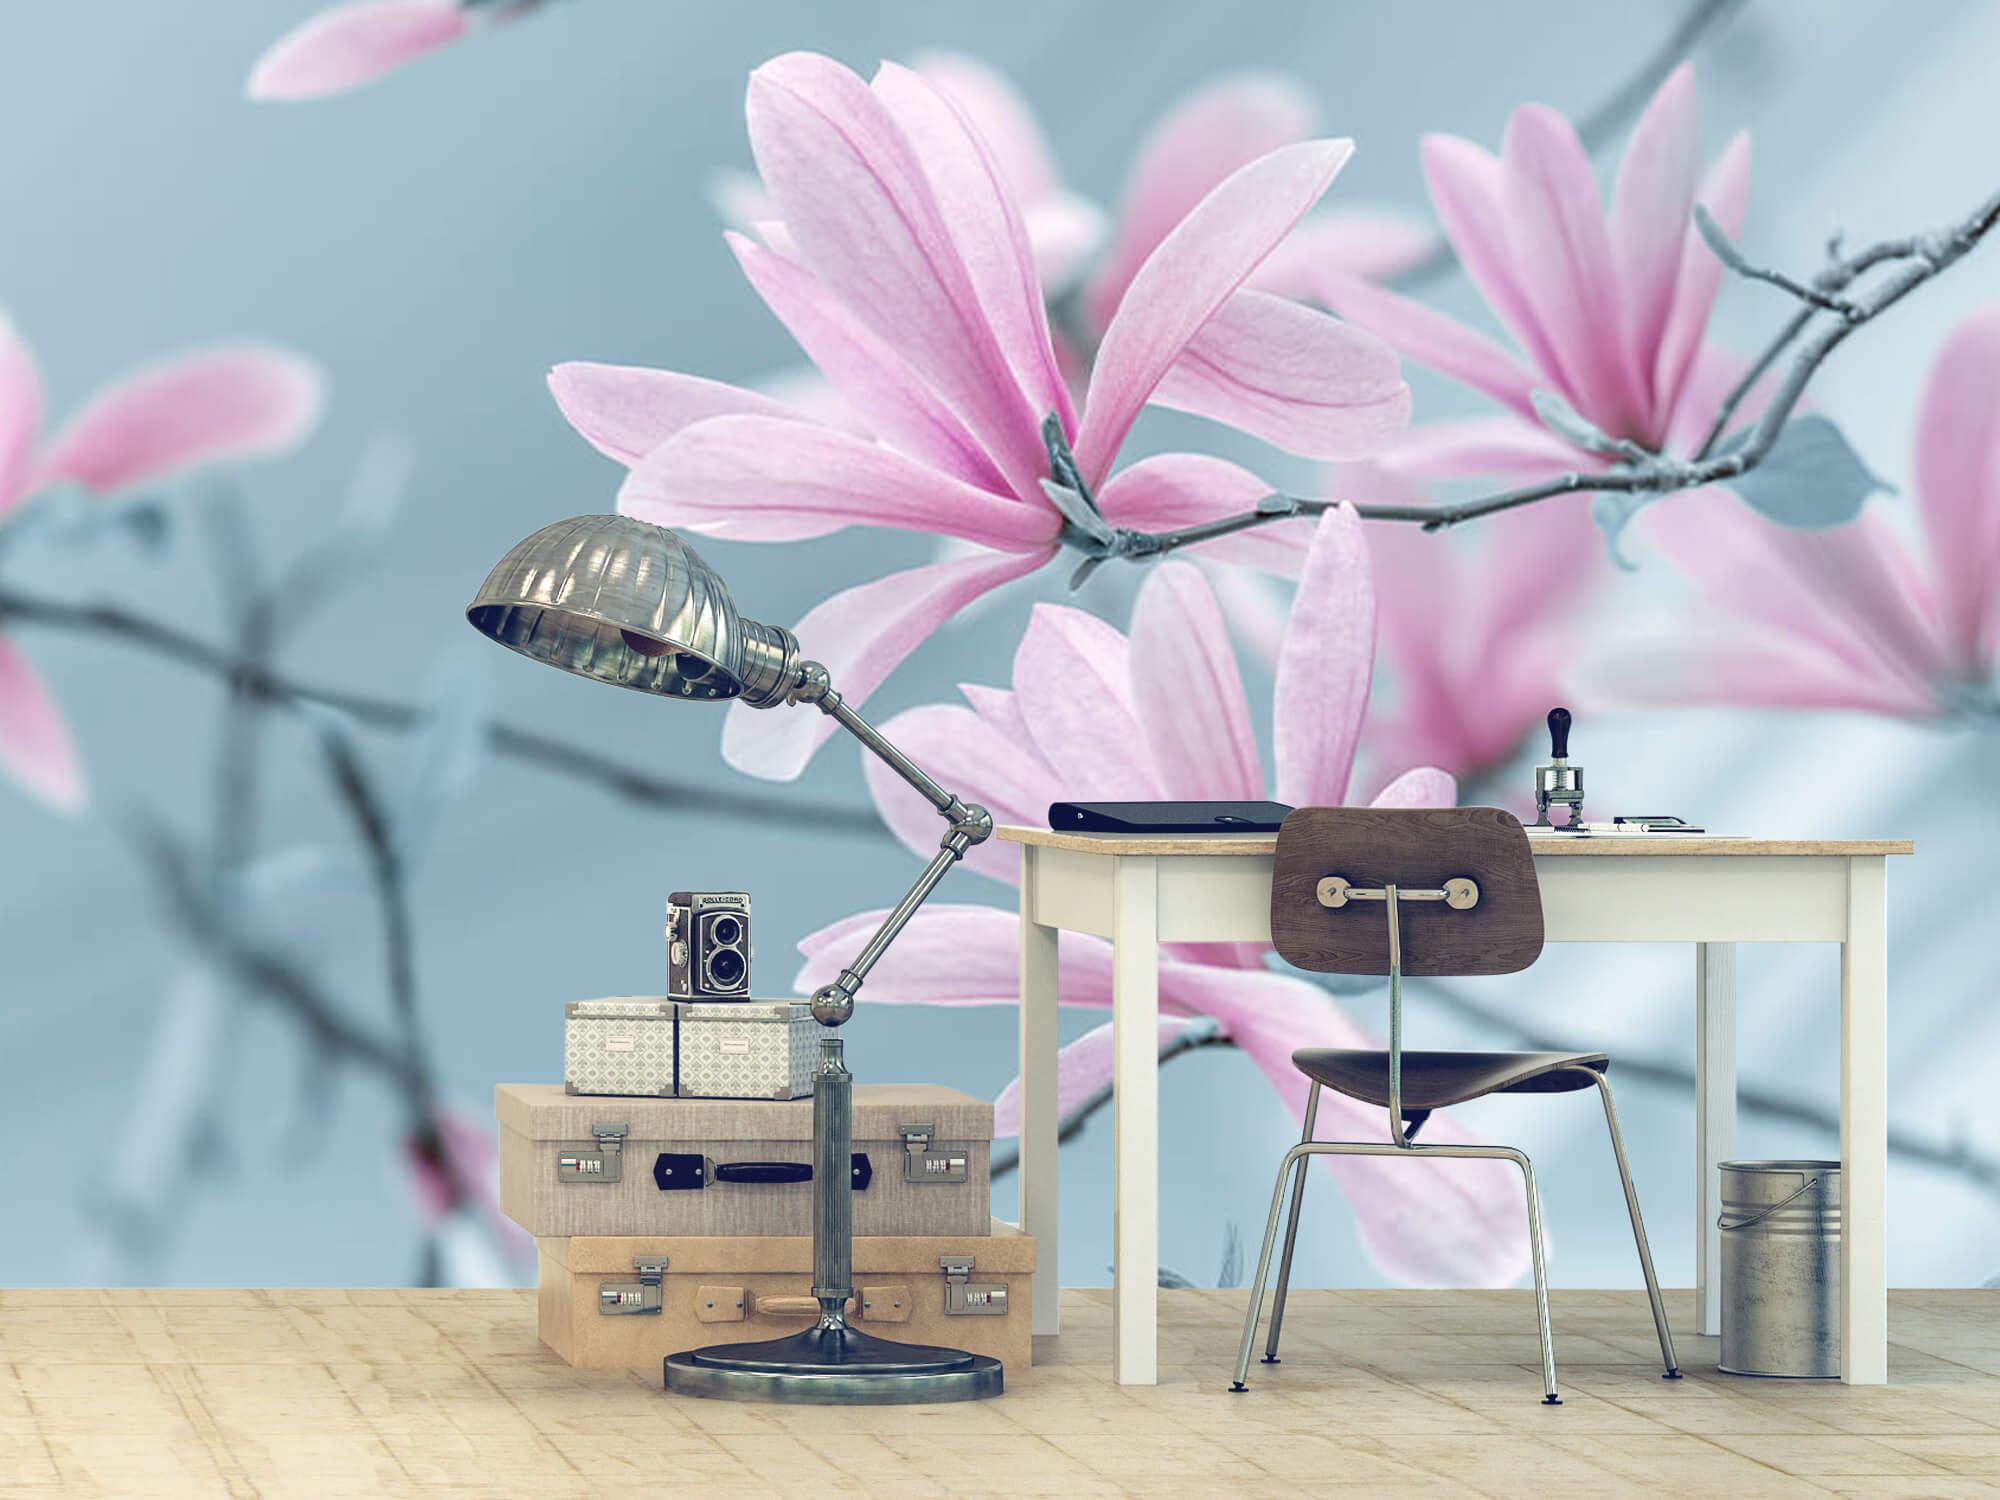 Magnolia bloemen 6